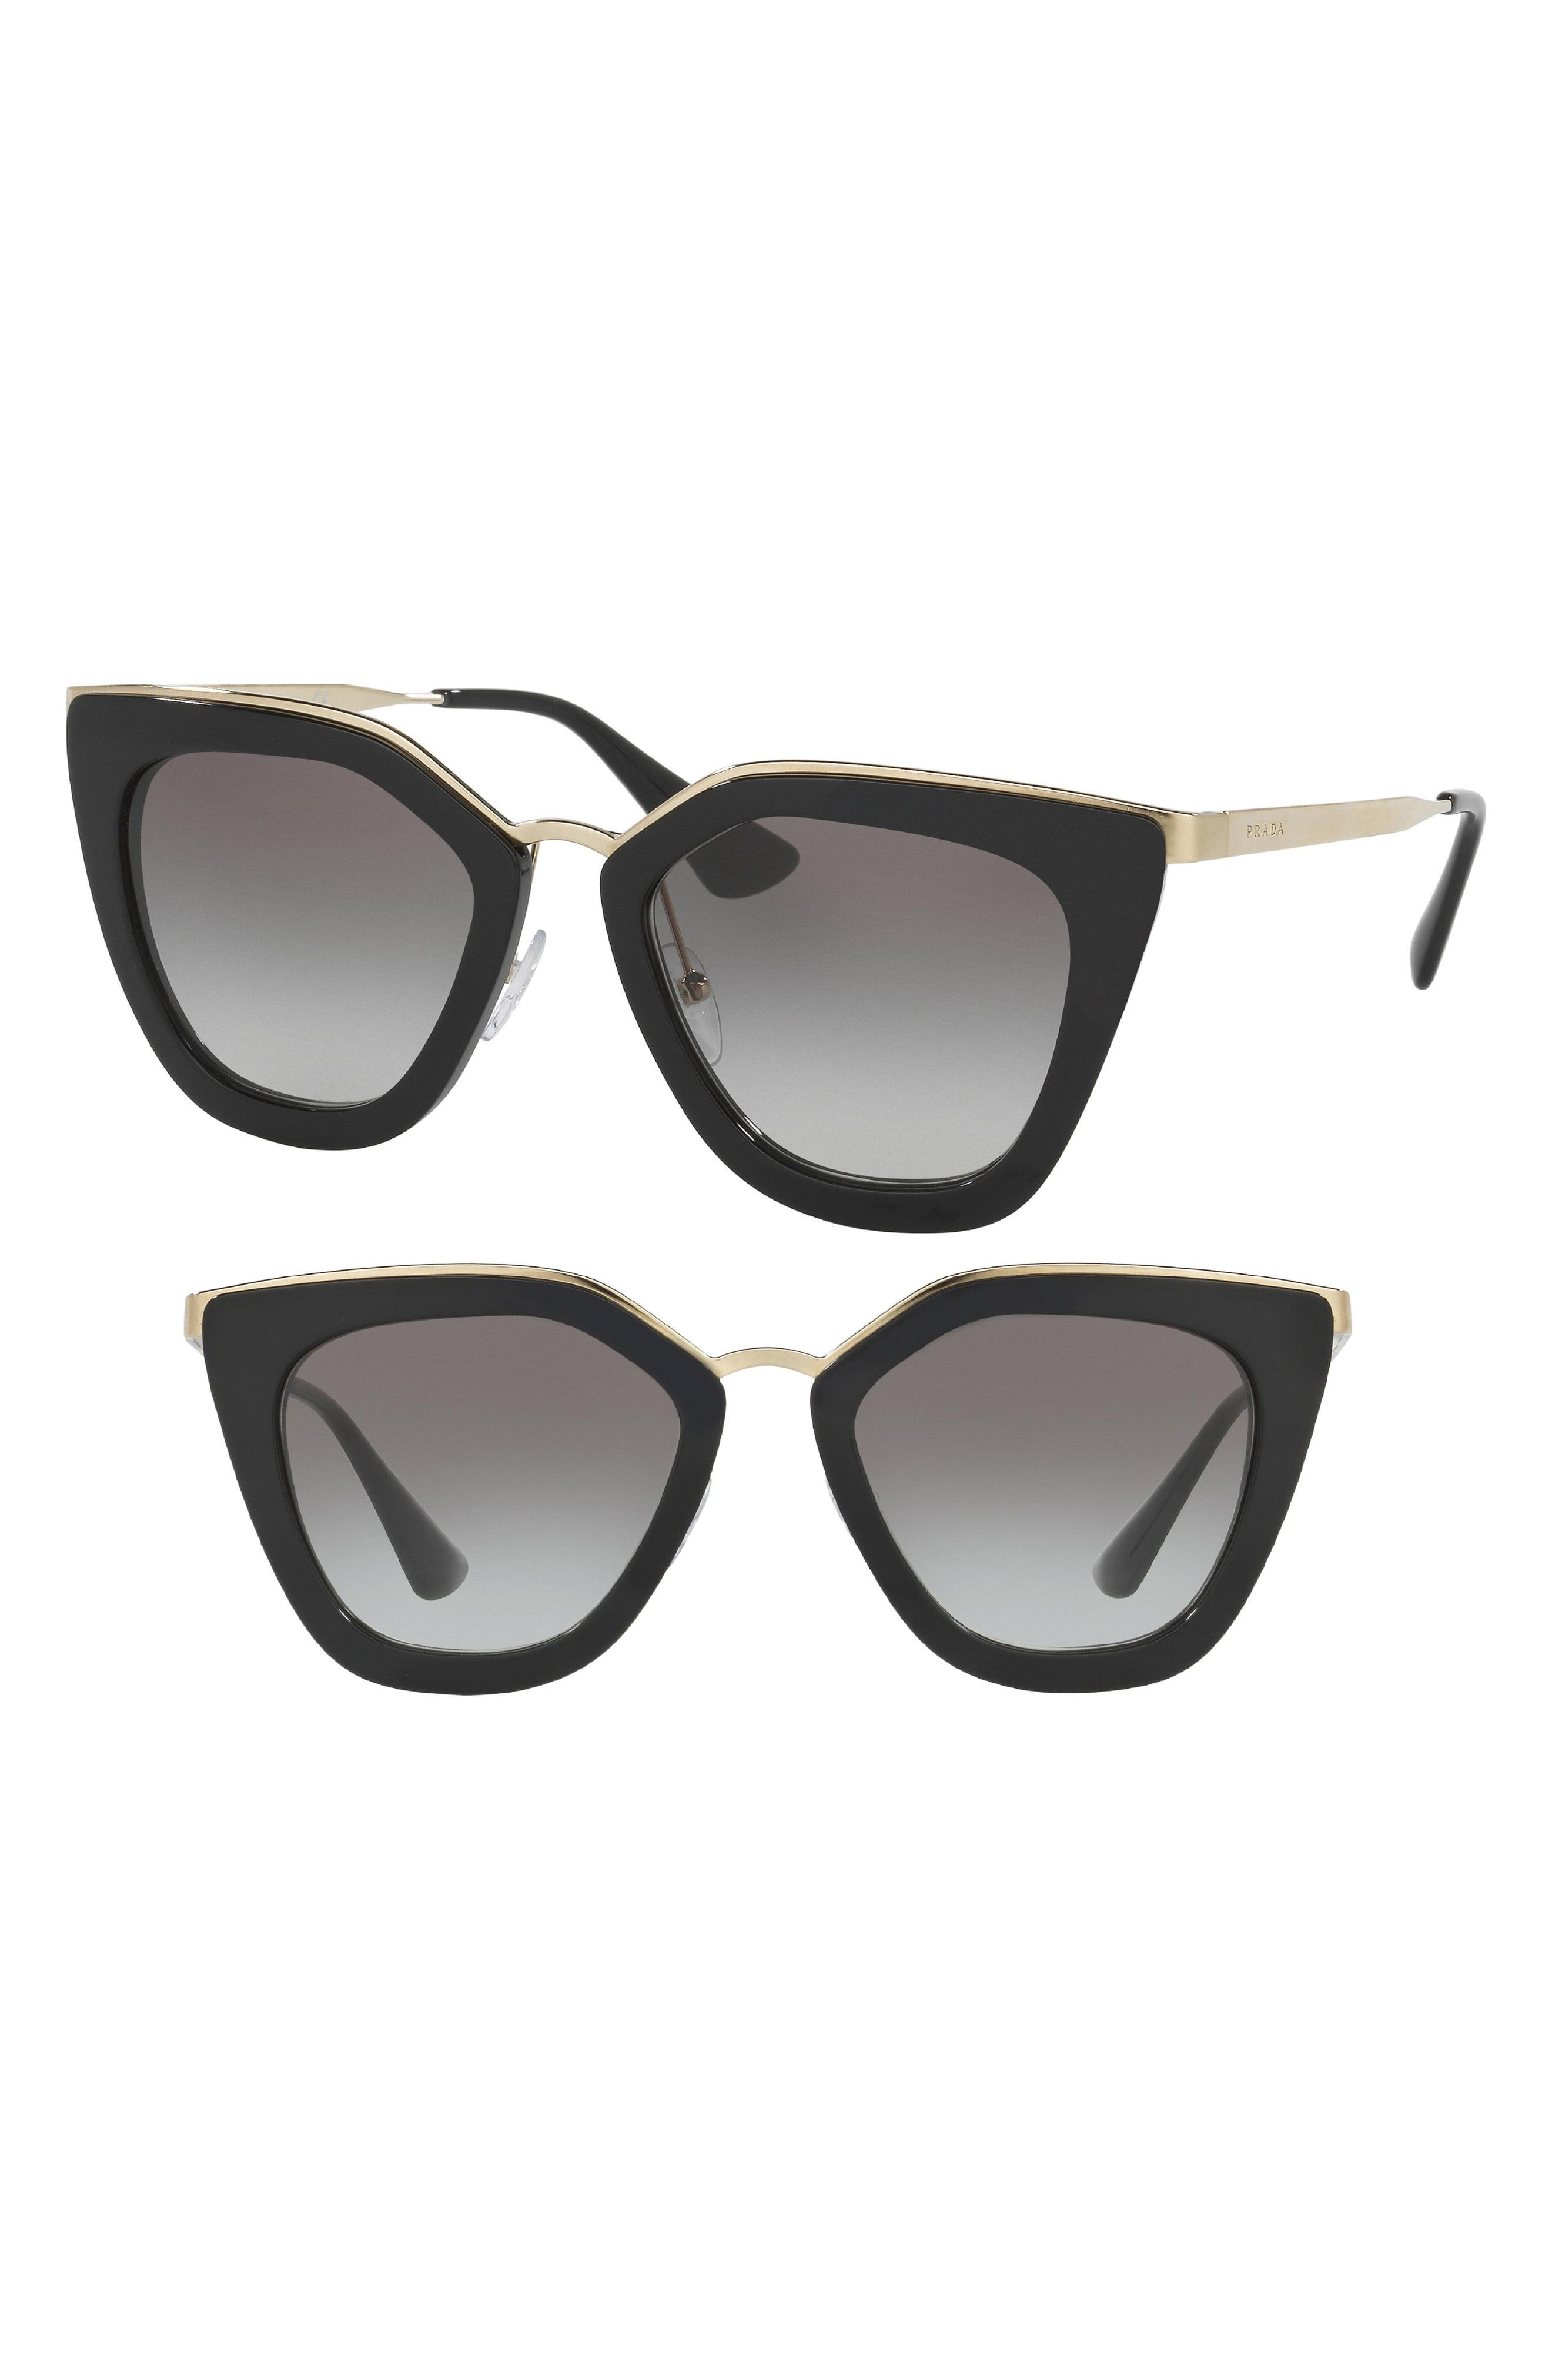 0a10fe8bb1 Prada - Multicolor 52mm Cat Eye Sunglasses - - Lyst. View fullscreen